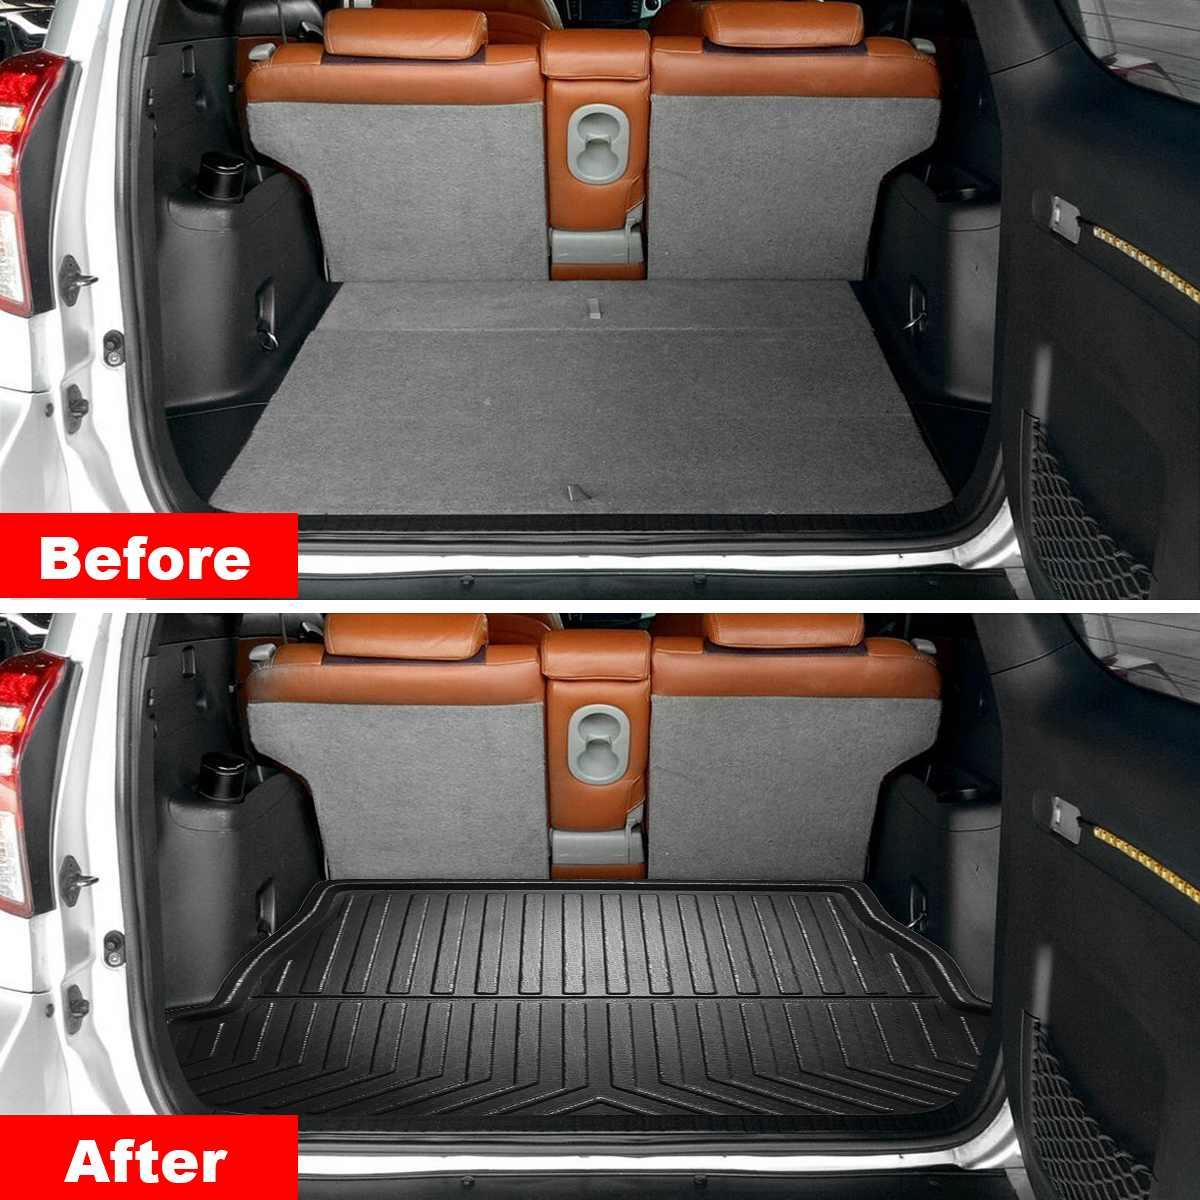 AUTO para cubierta de maletero Matt Mat de carga de arranque bandeja piso alfombra tiro Pad barro antideslizante Anti-polvo para Toyota RAV4 2019 2020 XA50